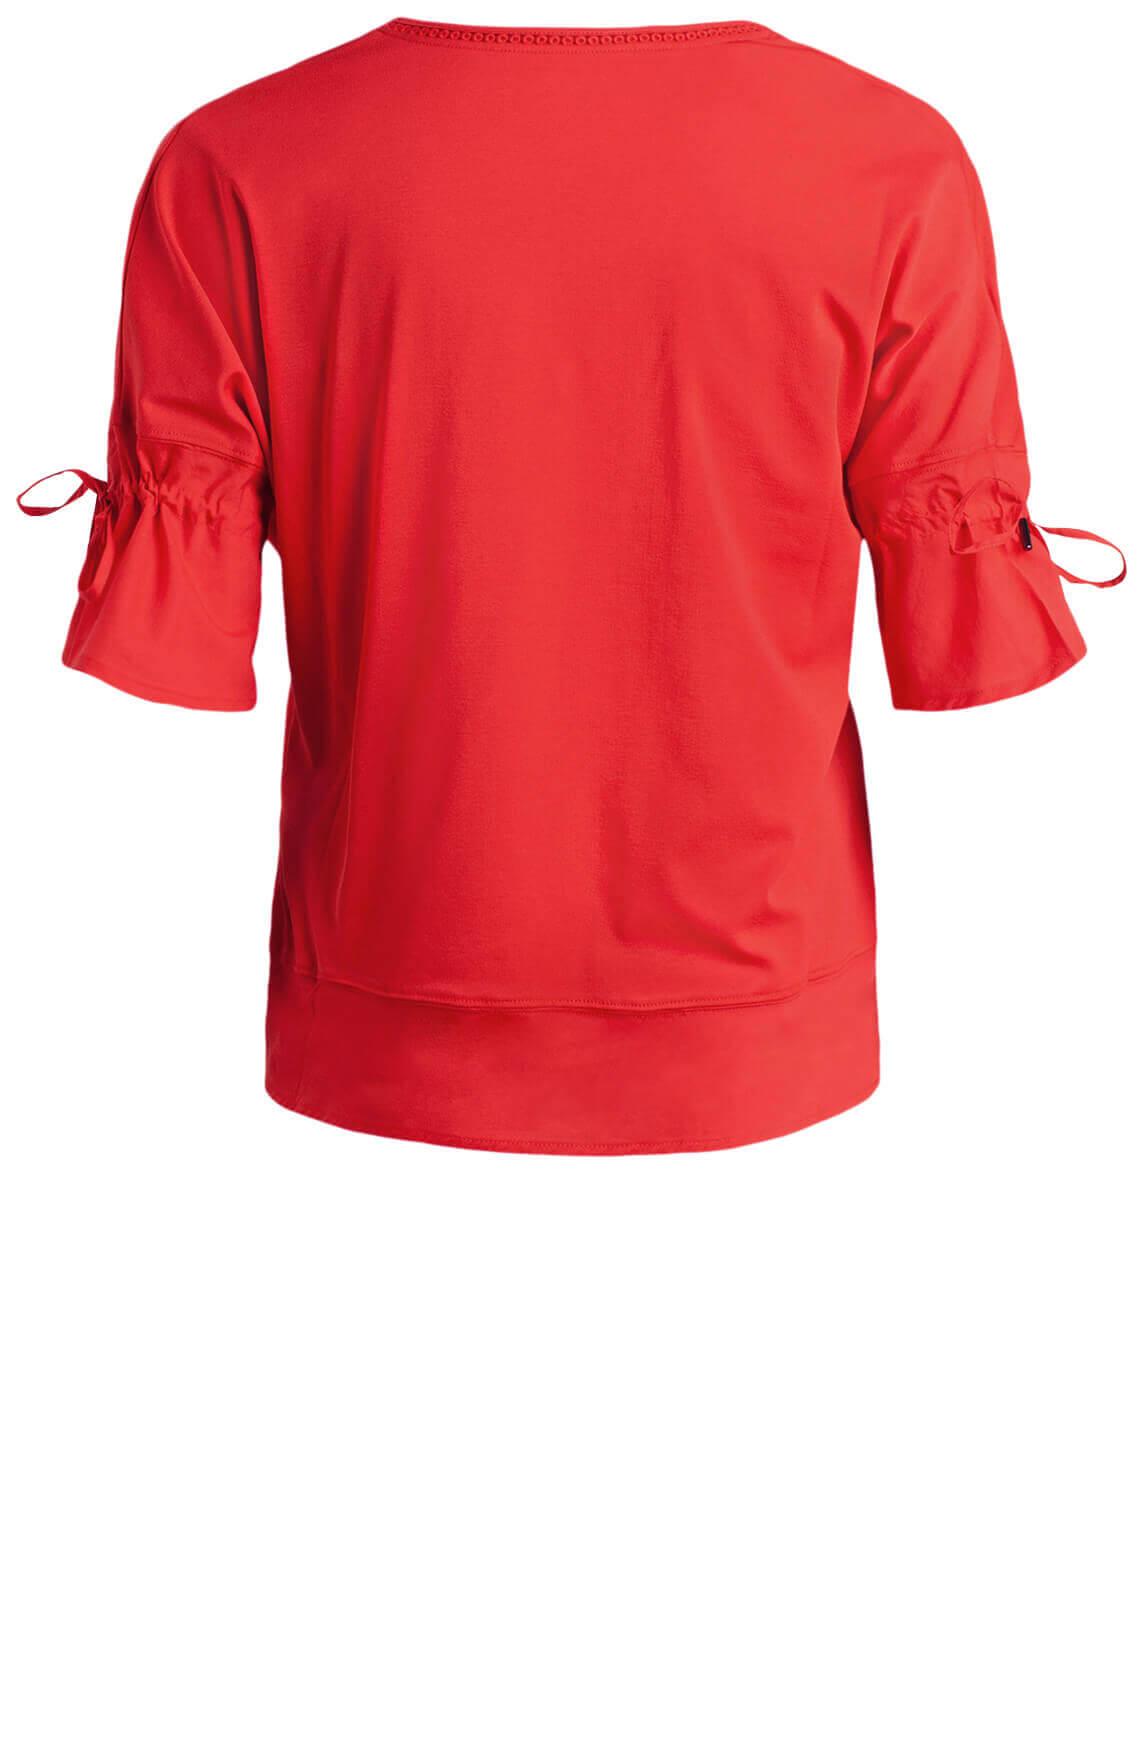 Marccain Dames Shirt met borduursel Rood